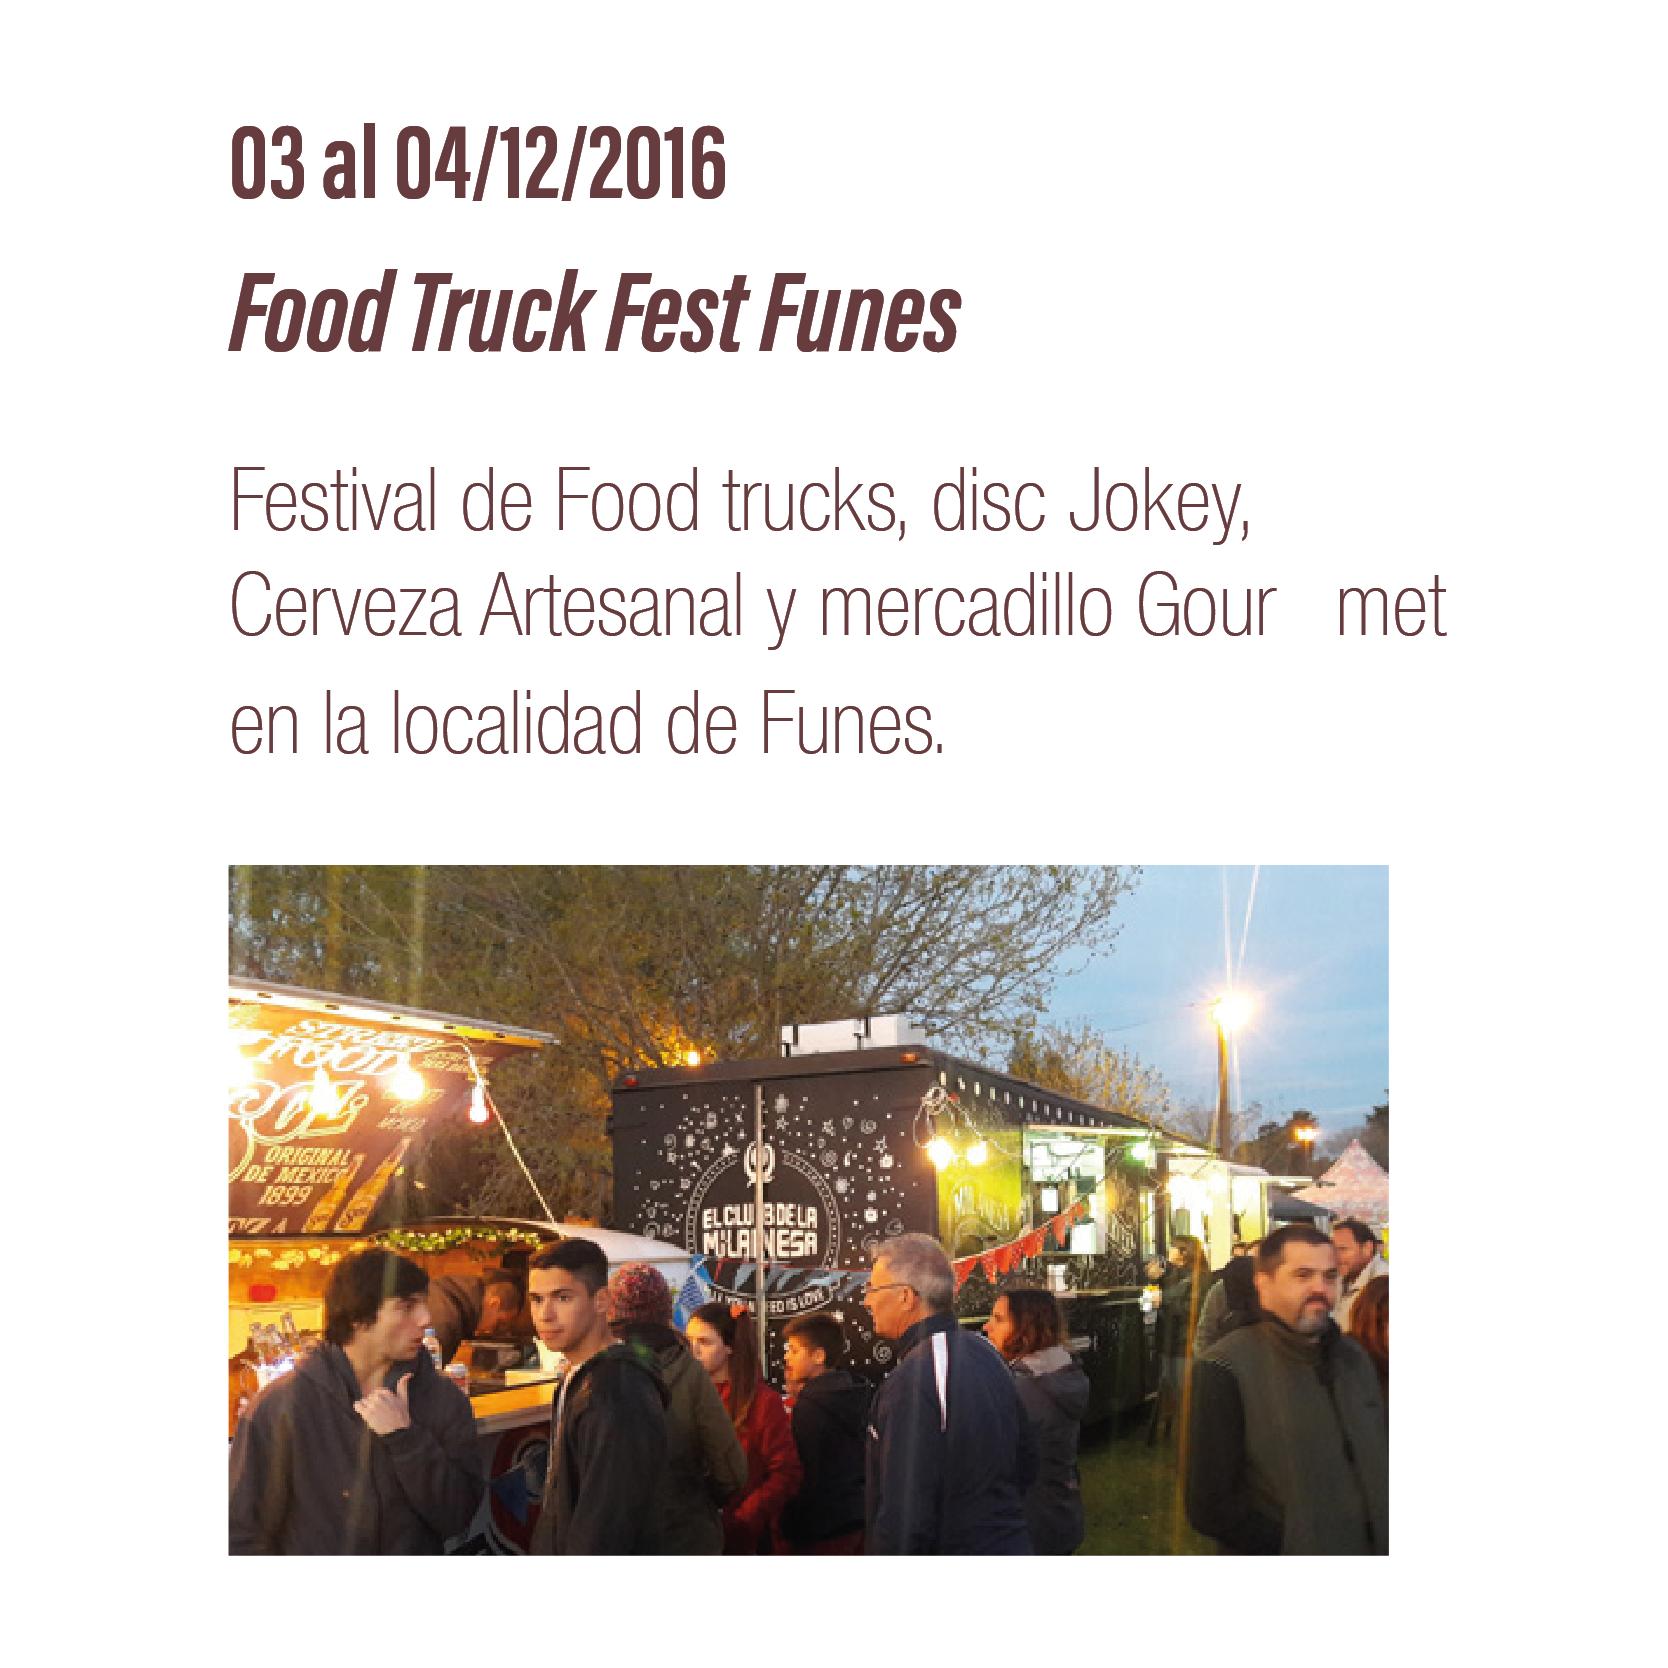 Food Truck Fest Funes